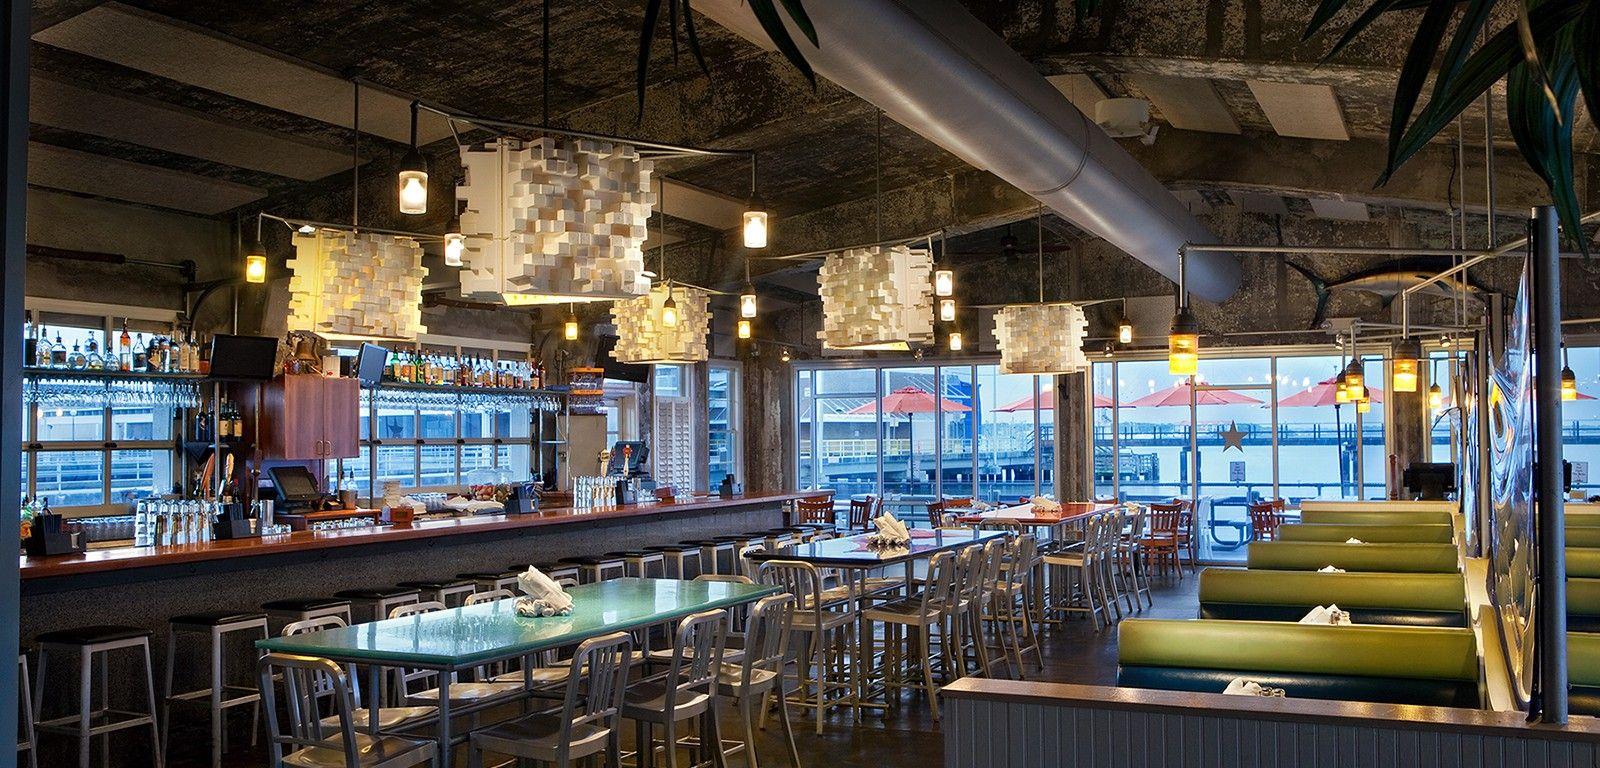 Fleet landing restaurant bar charleston sc fleet